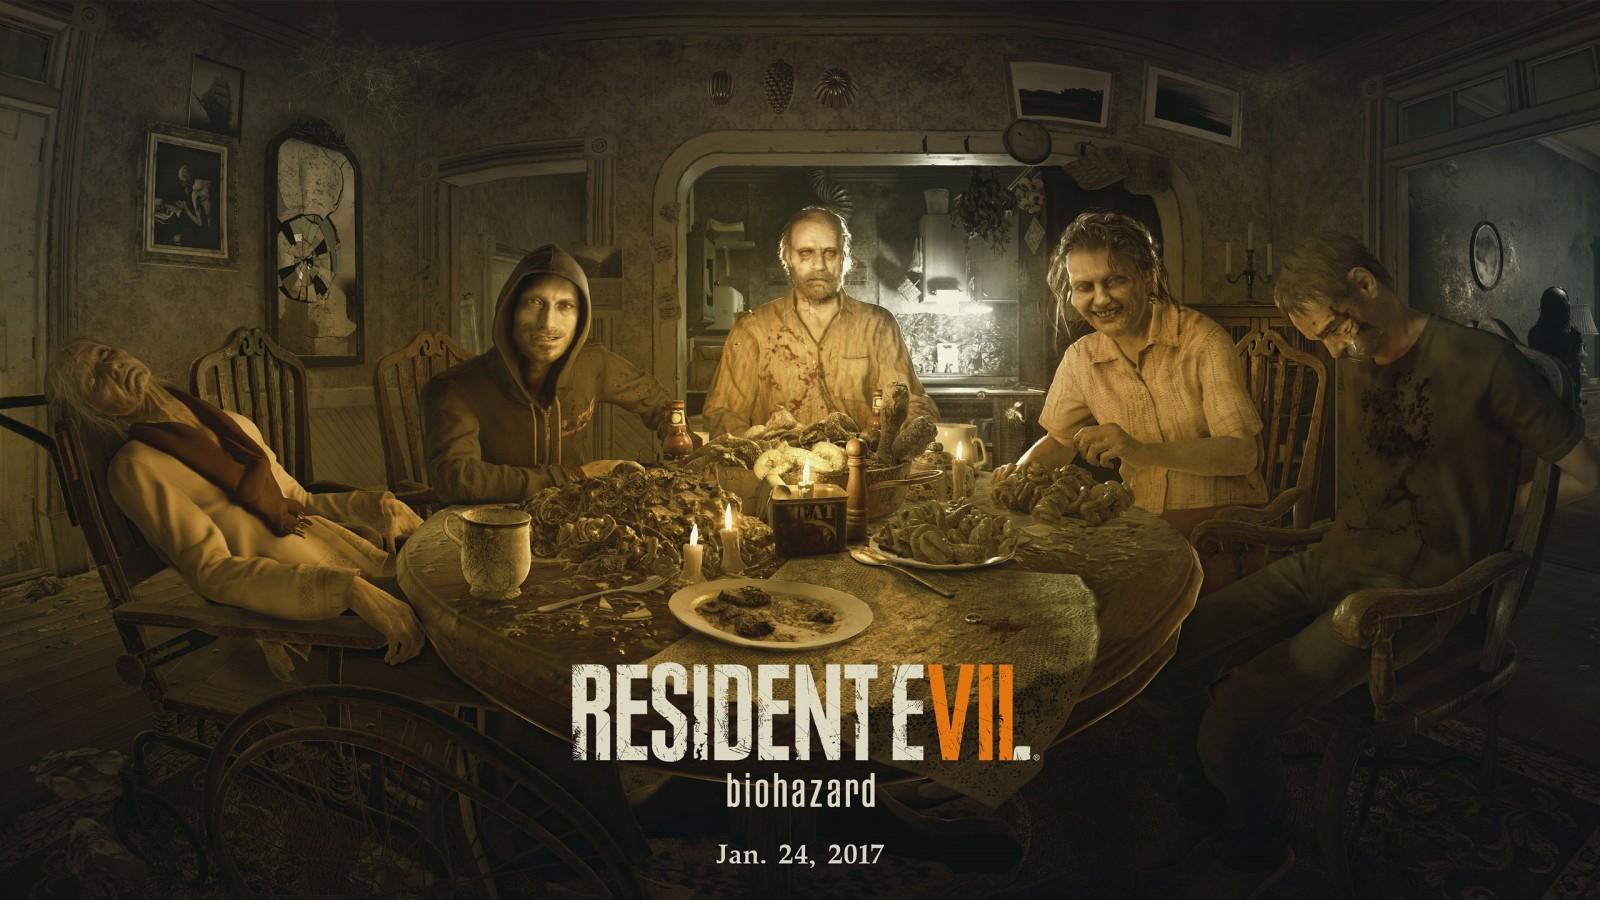 Biohazard Wallpaper 3d Resident Evil 7 Biohazard 2017 Game Wallpapers Hd